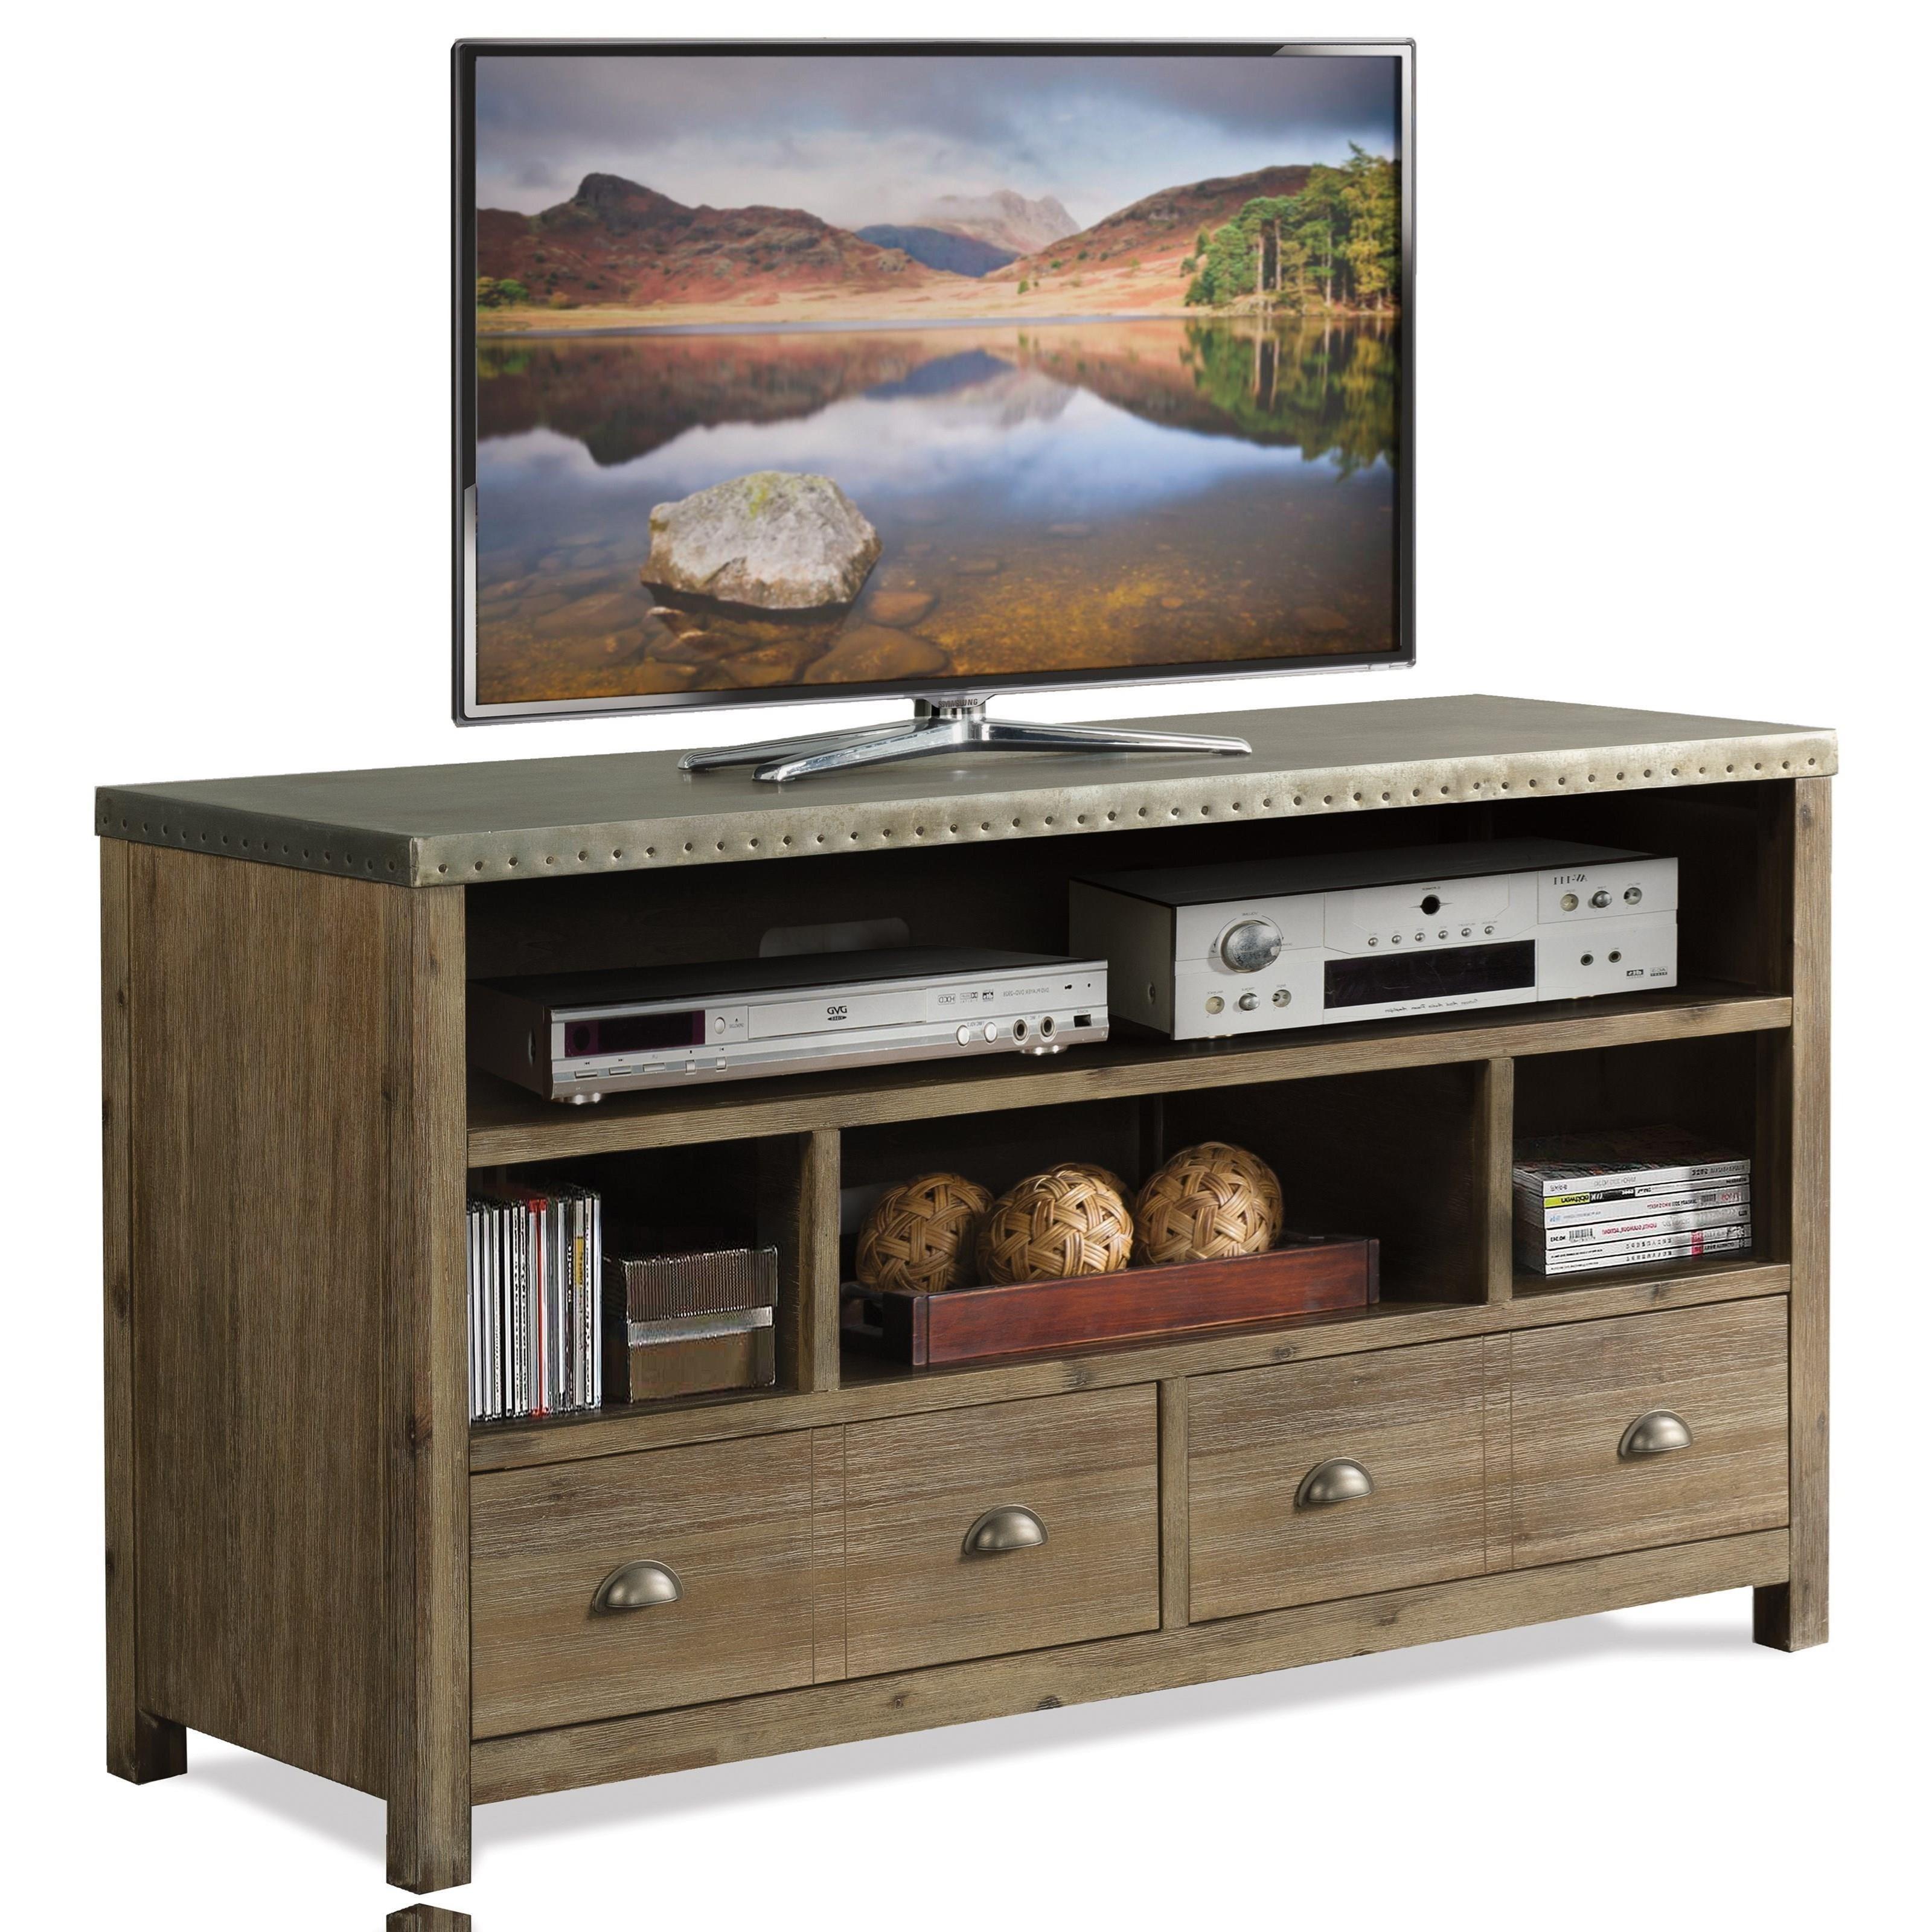 54-In TV Console